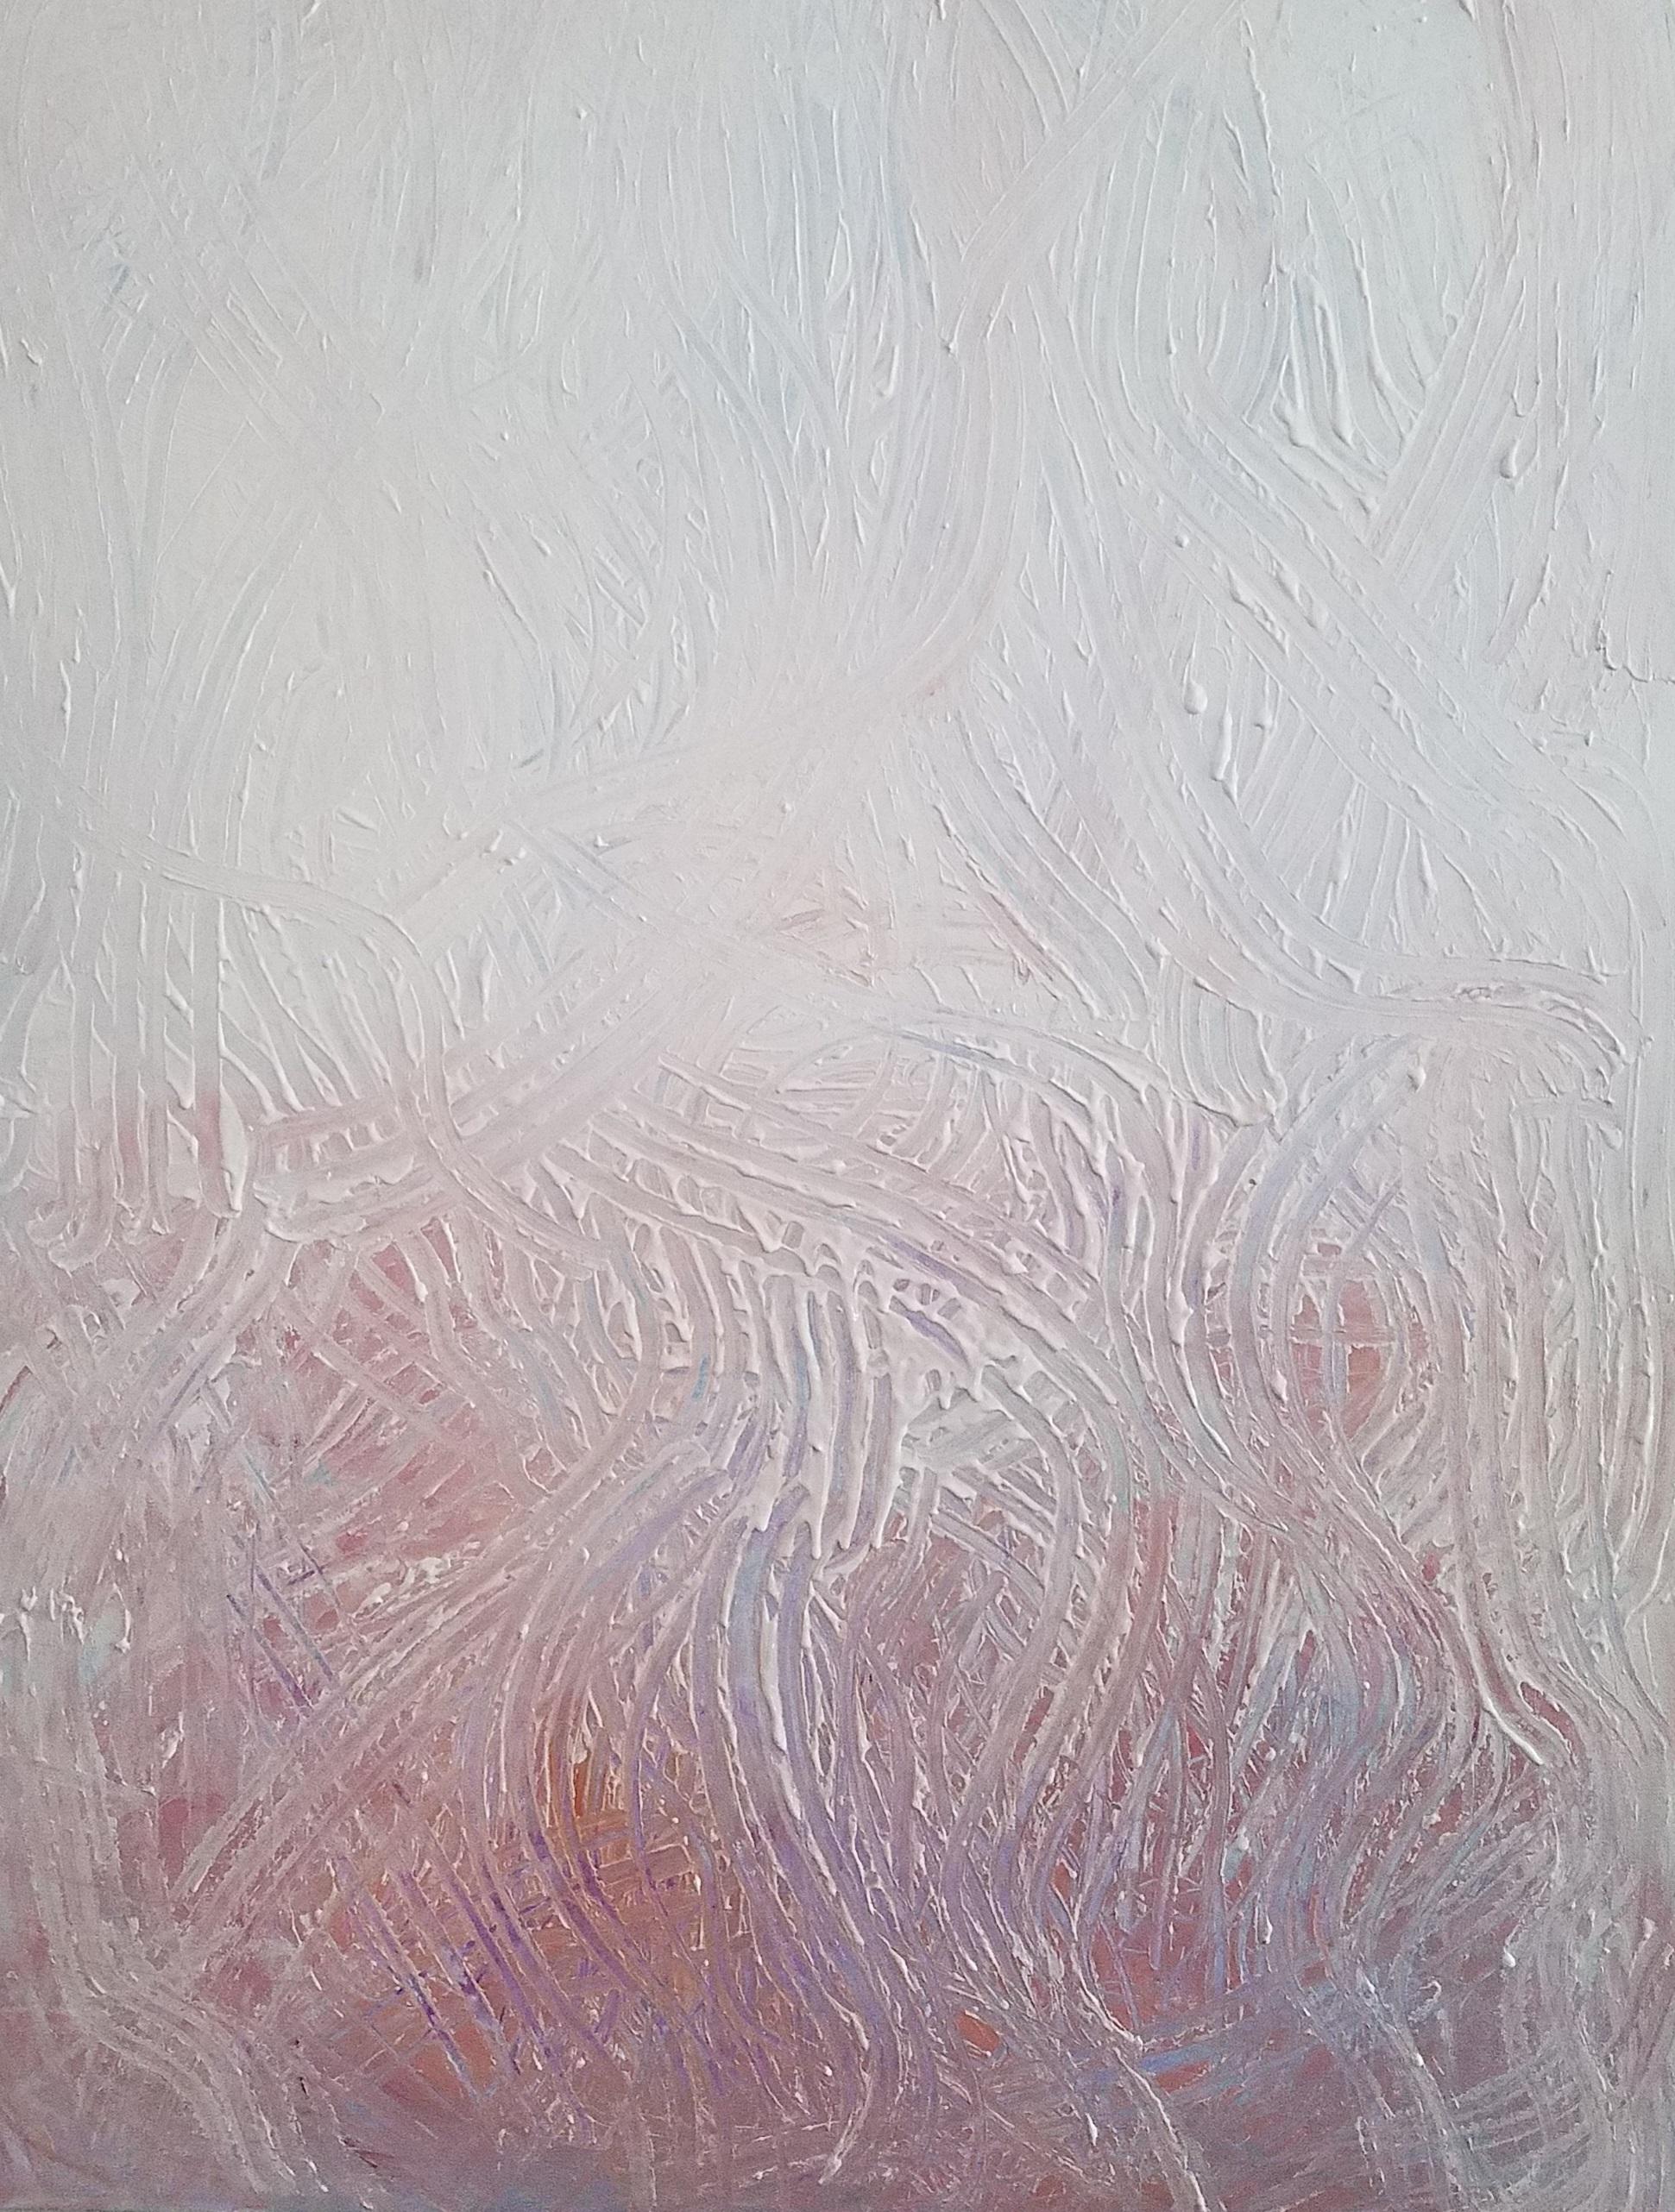 Cool Breeze artwork by Angela Setzer - art listed for sale on Artplode